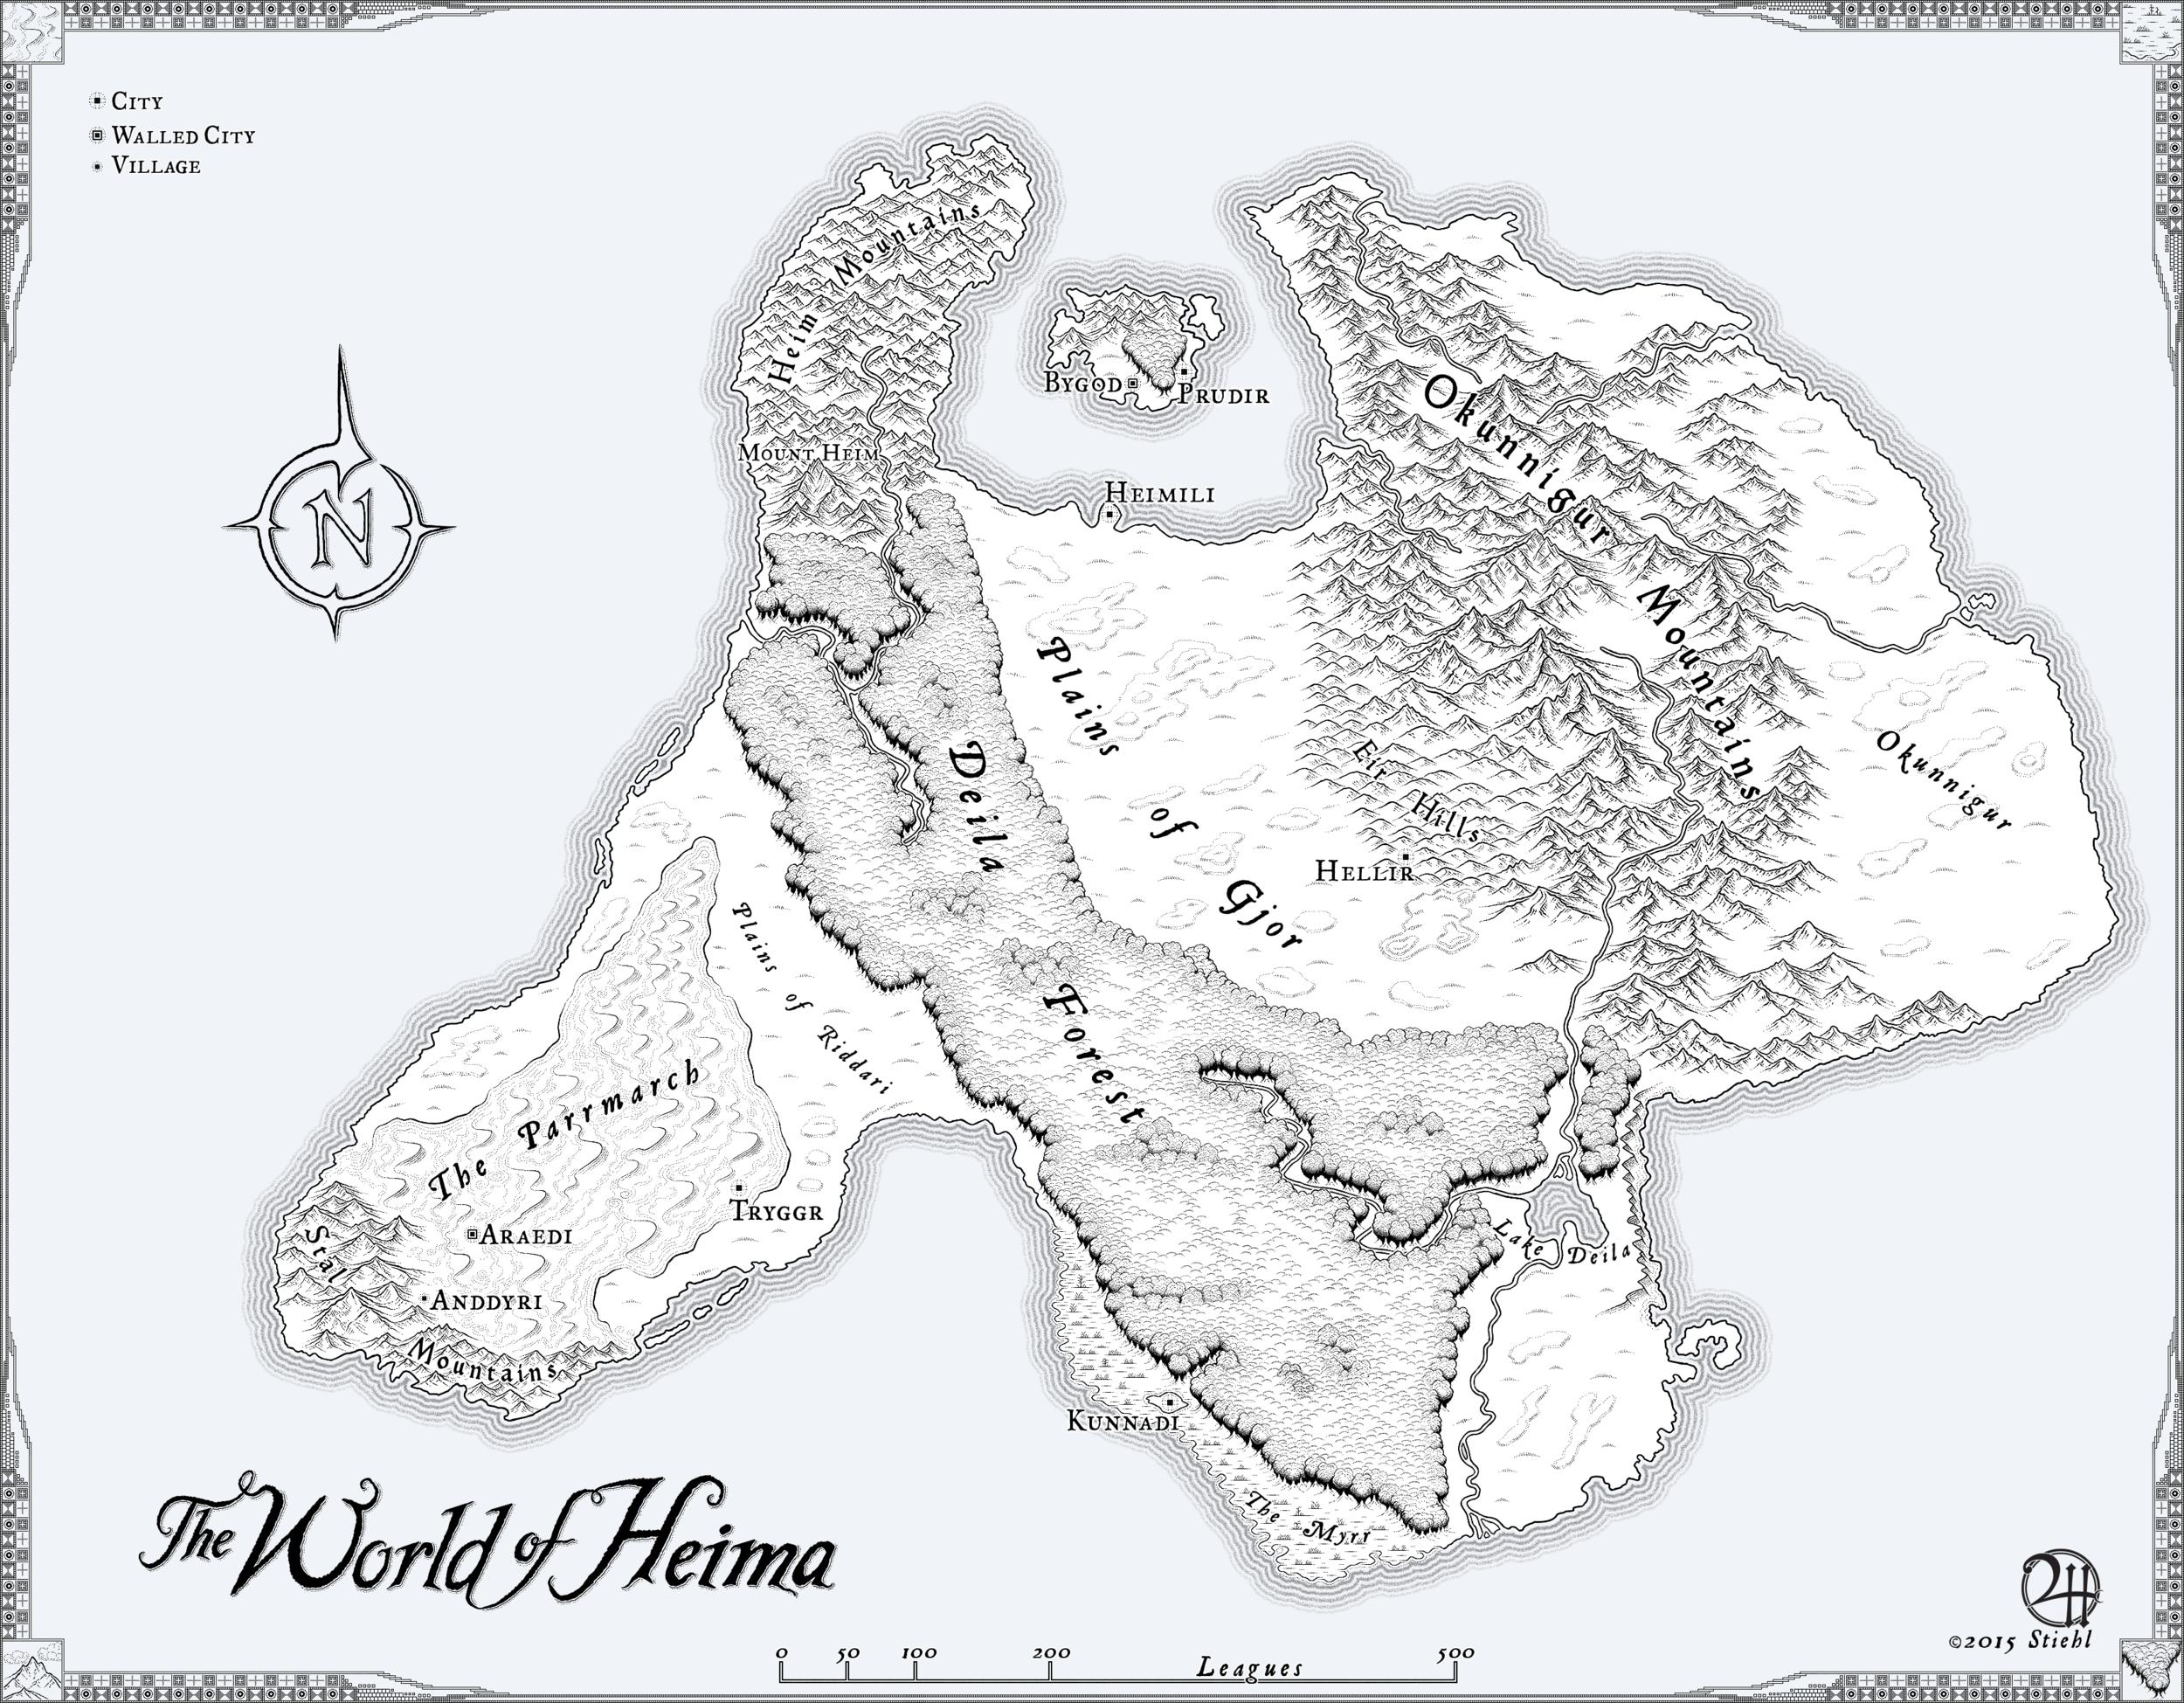 Map for Shawn Gunn's Novel